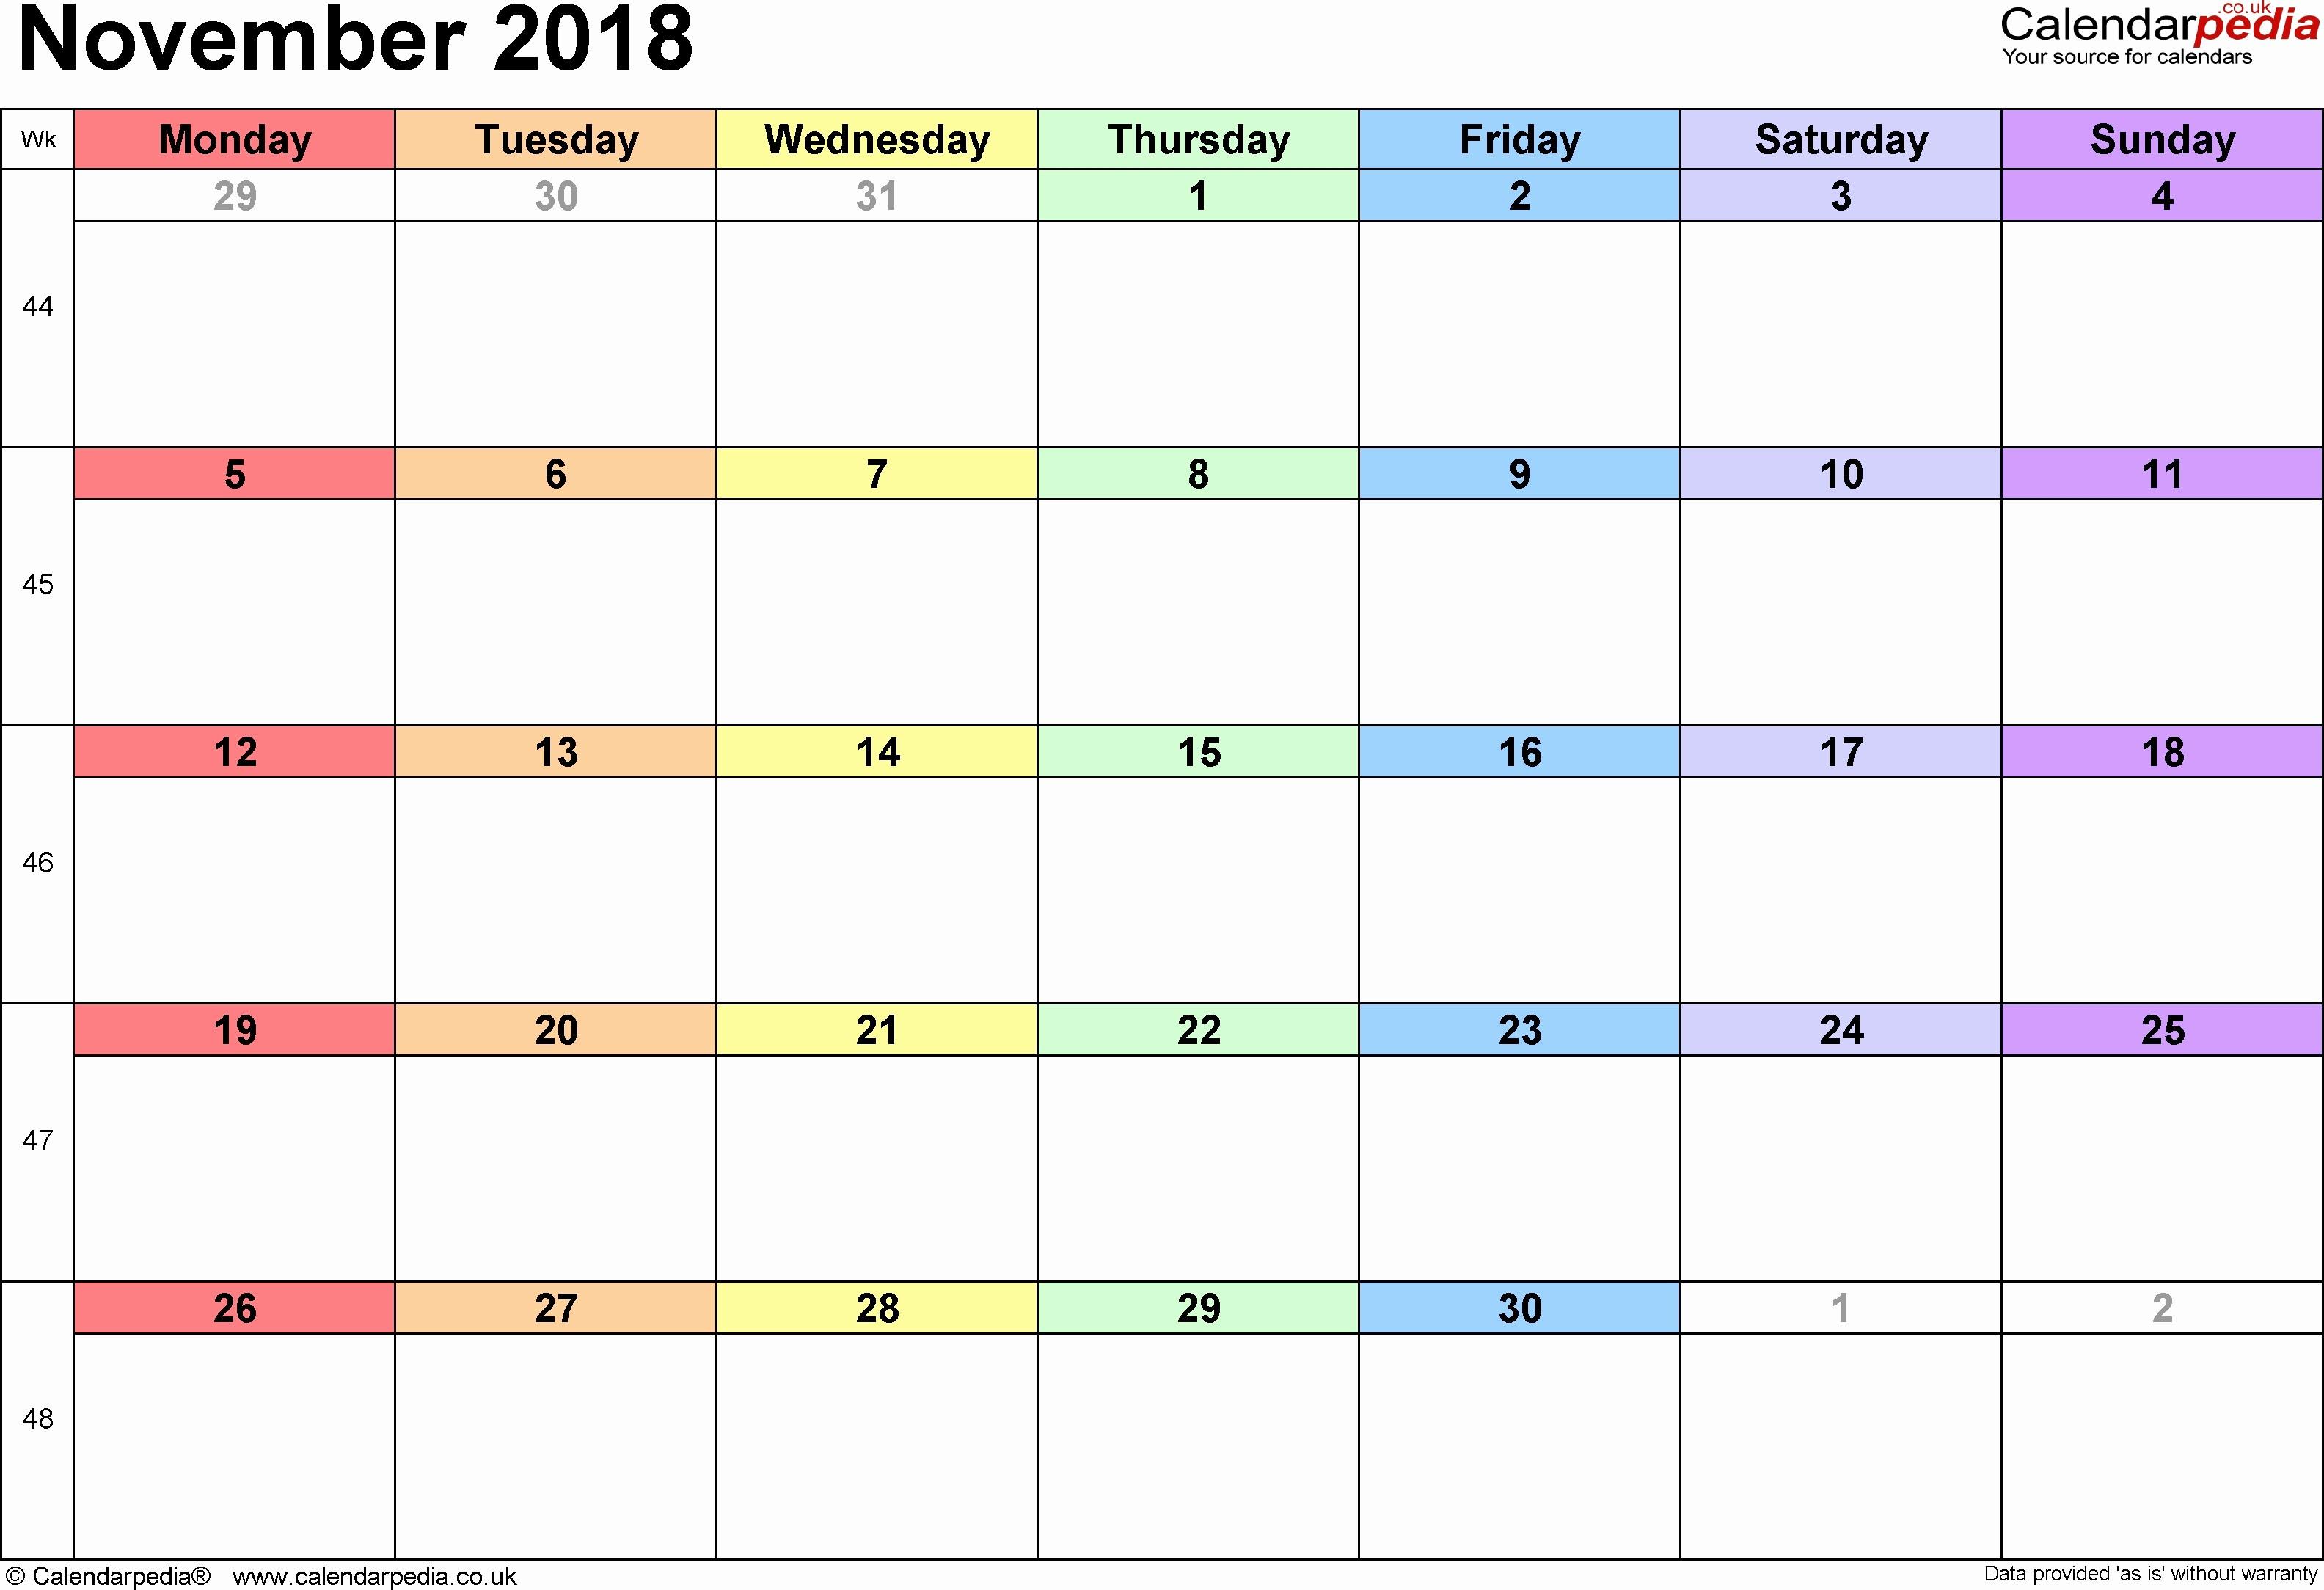 Monday Through Sunday Calendar Template Fresh November 2018 Monday Through Sunday – Template Calendar Design